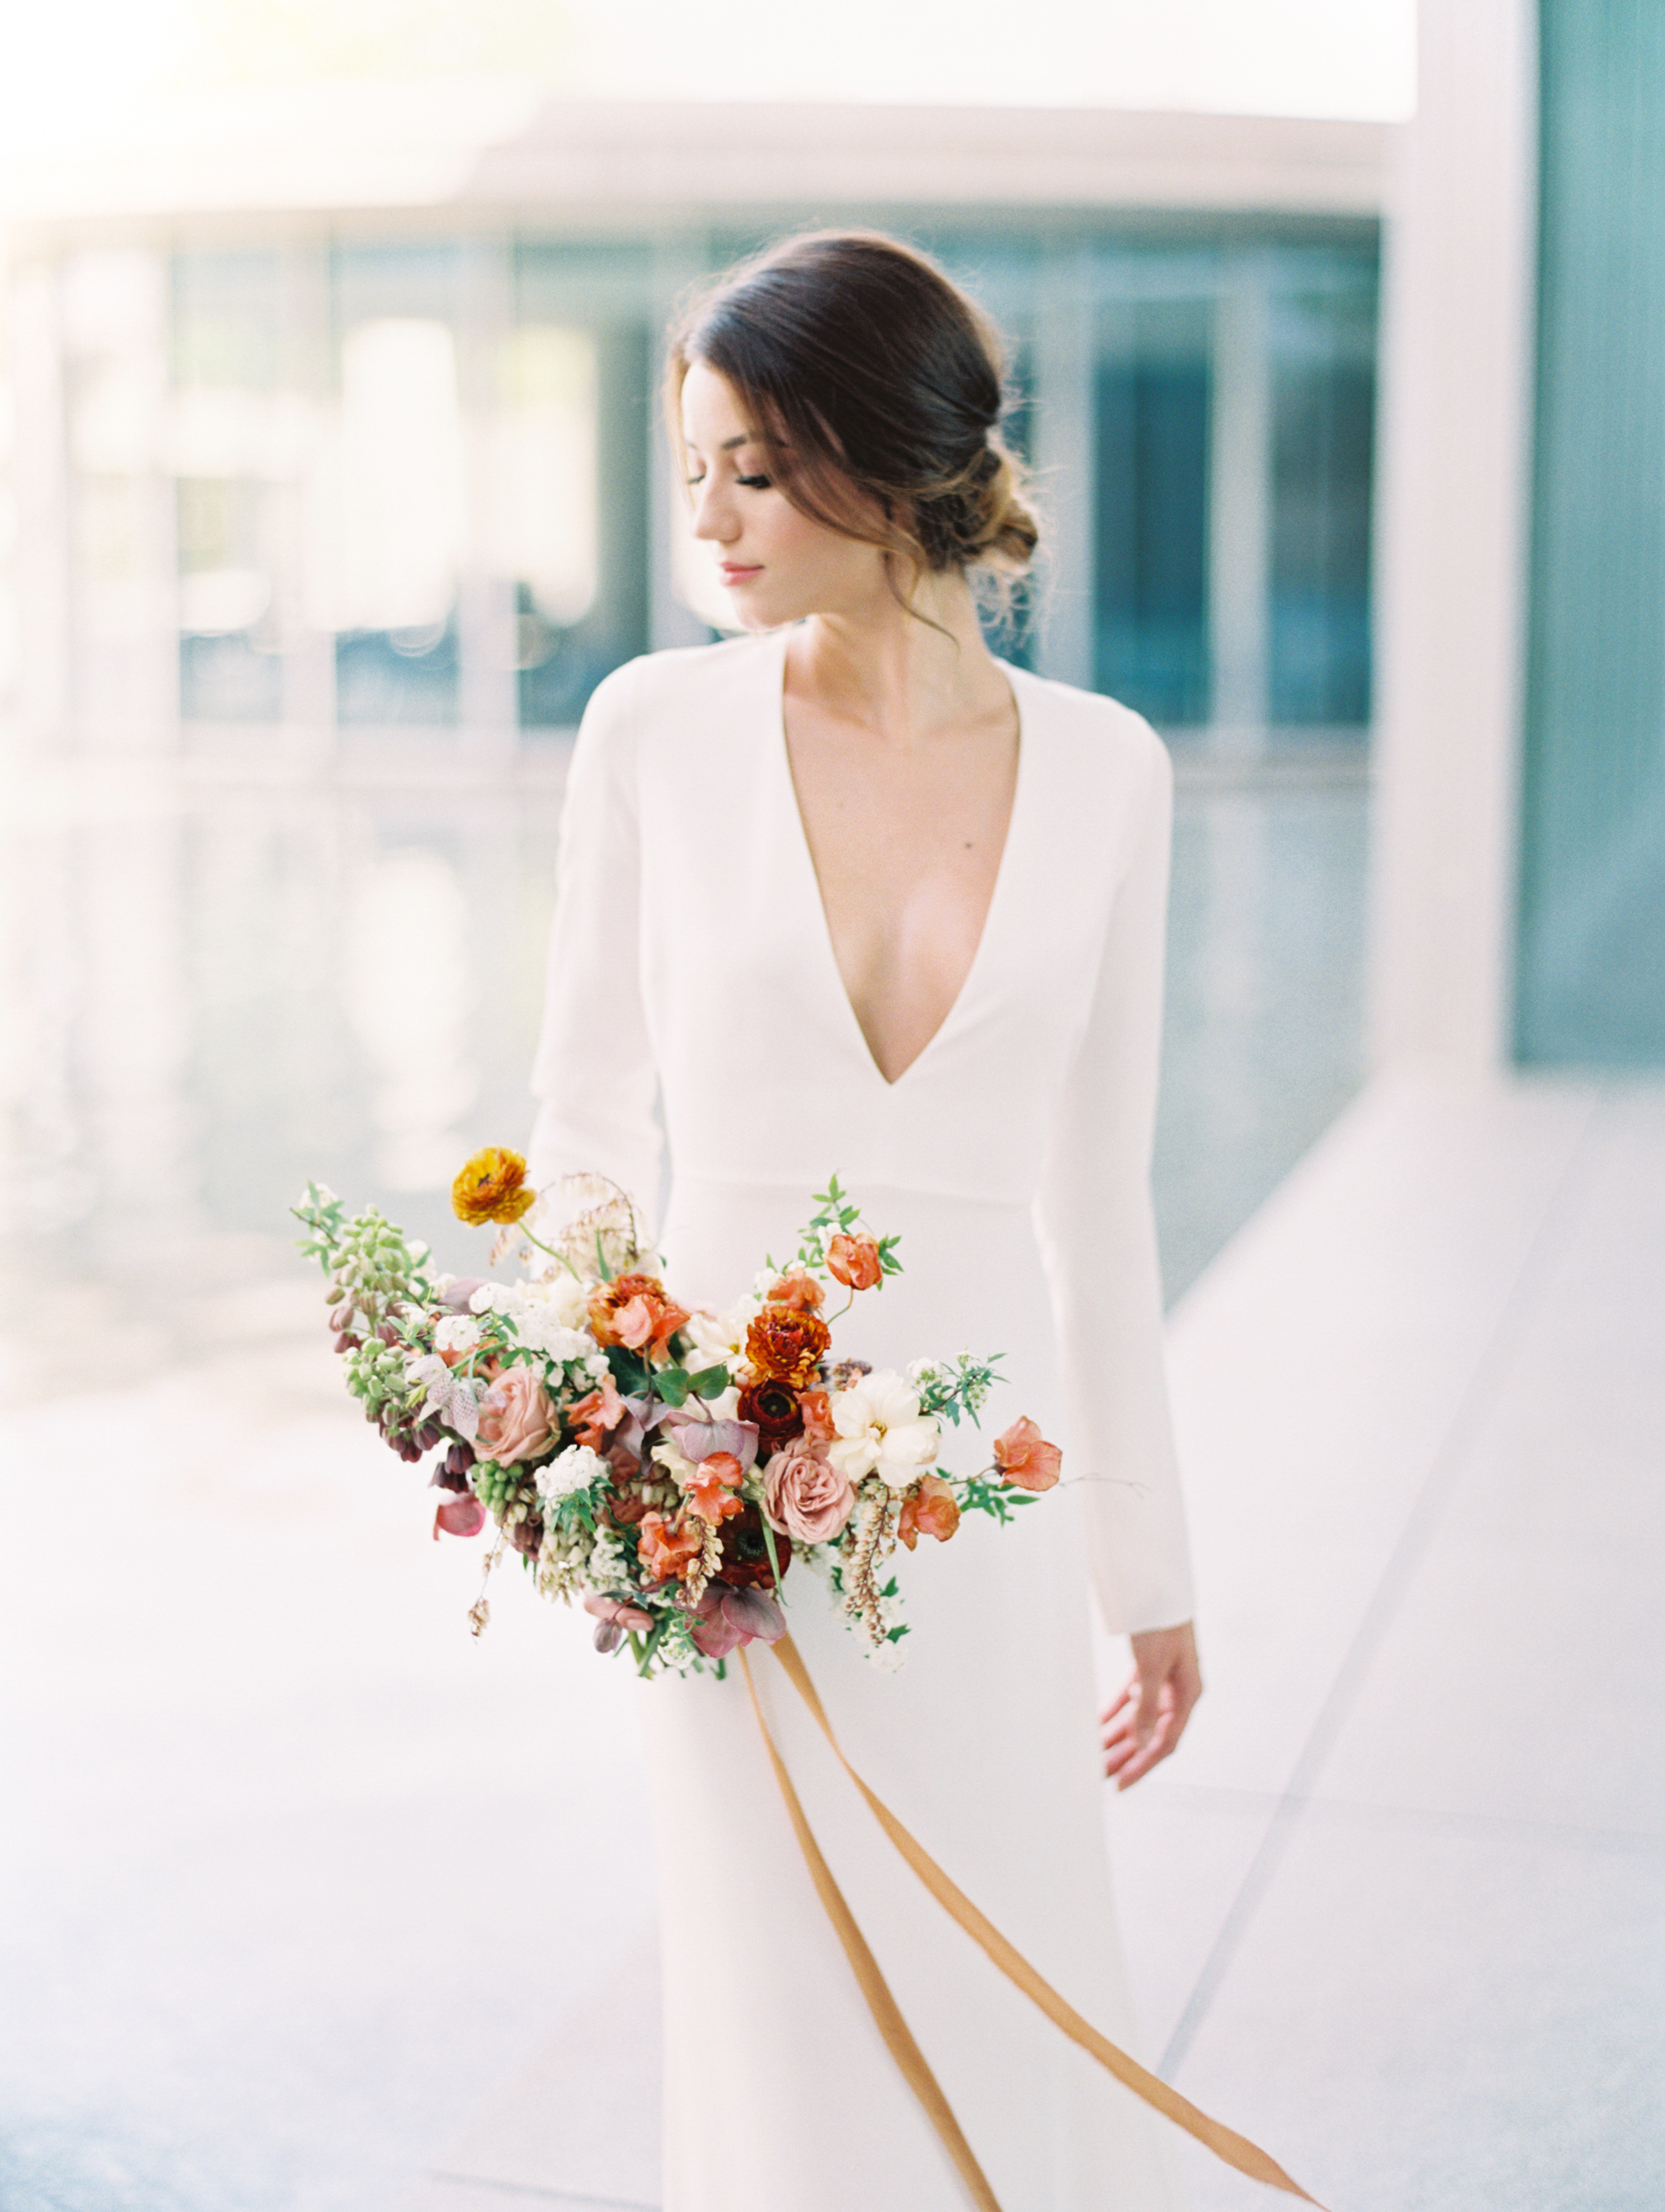 Lyons-Events-Modern-Bouquet-Minimalist-Abelia-Floral-Allen-Tsai